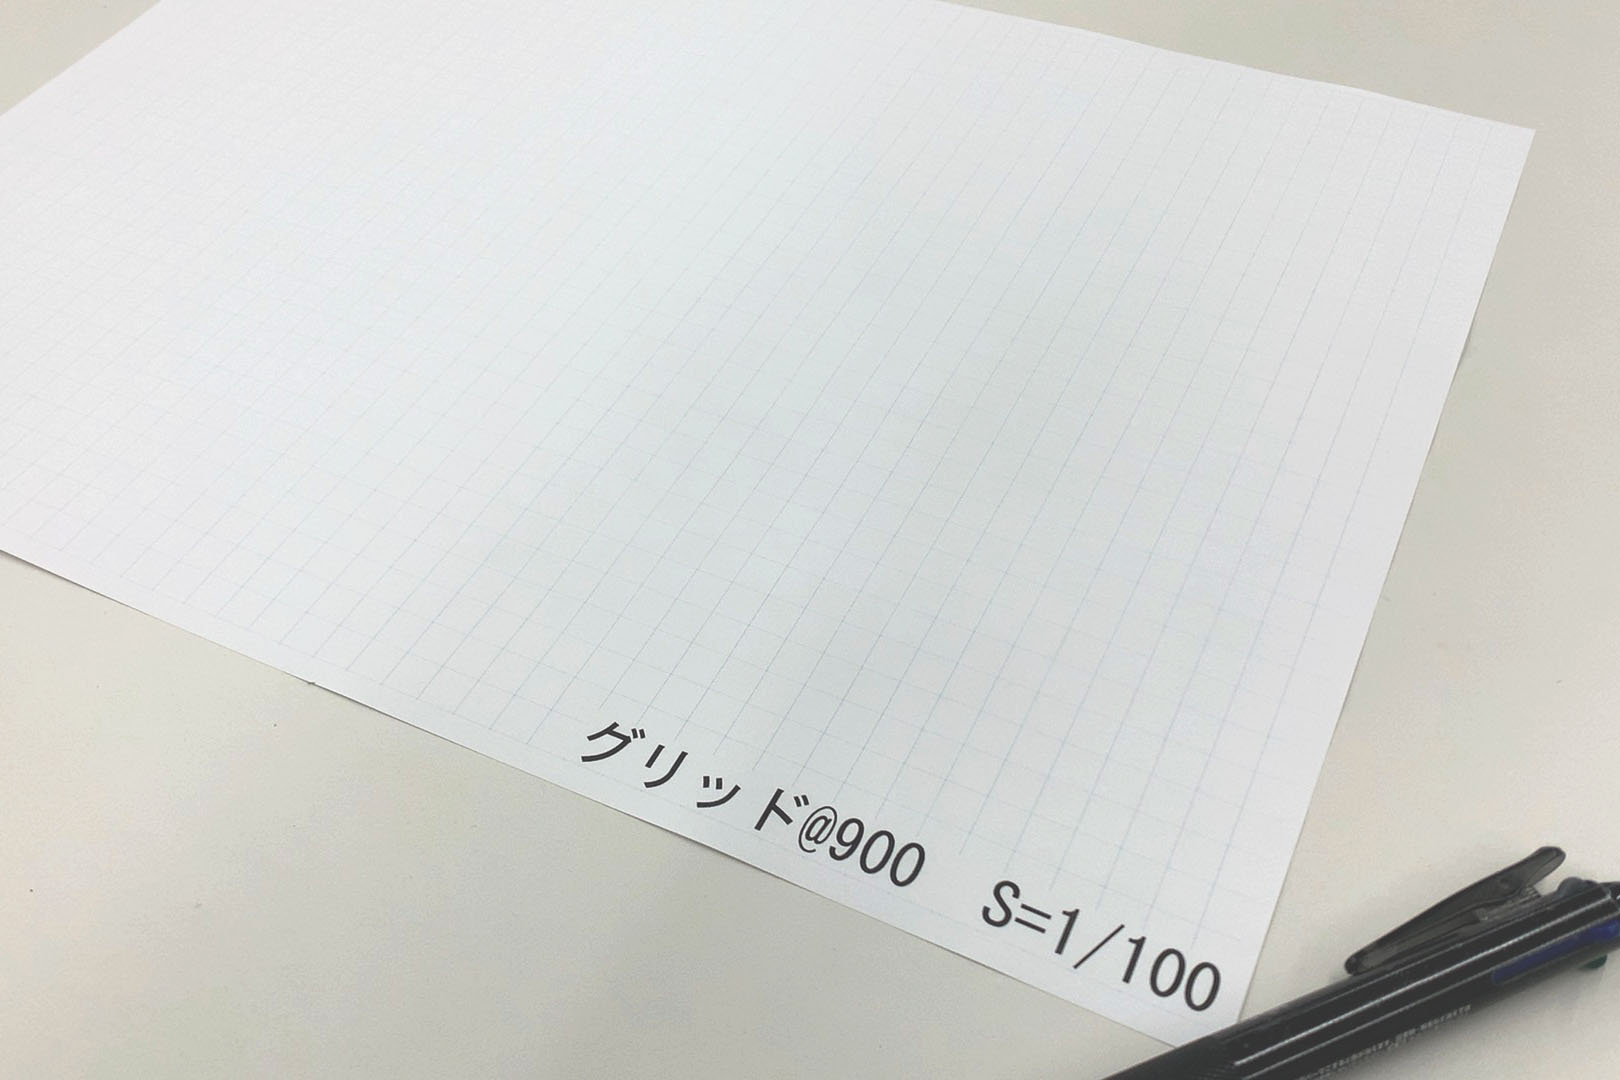 Vectorworksで水色のグリッド線を印刷で表示する方法